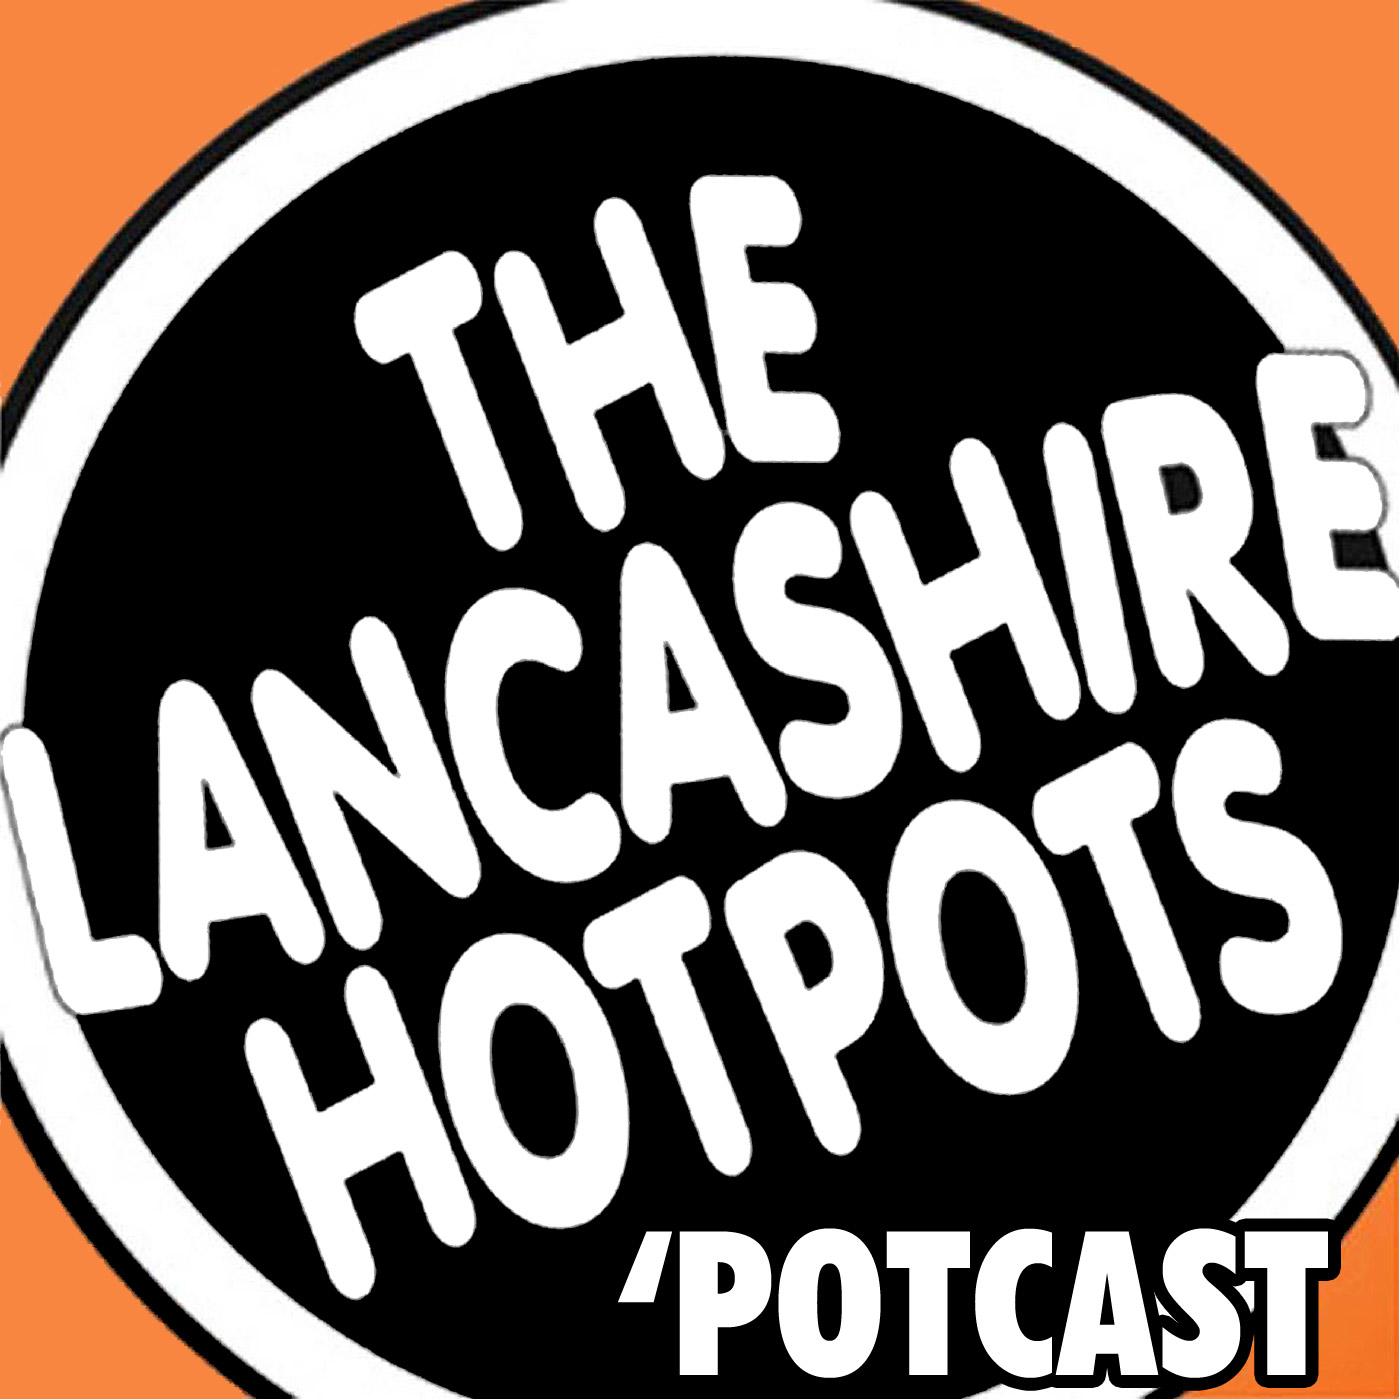 The Lancashire Hotpots October 2015 Potcast